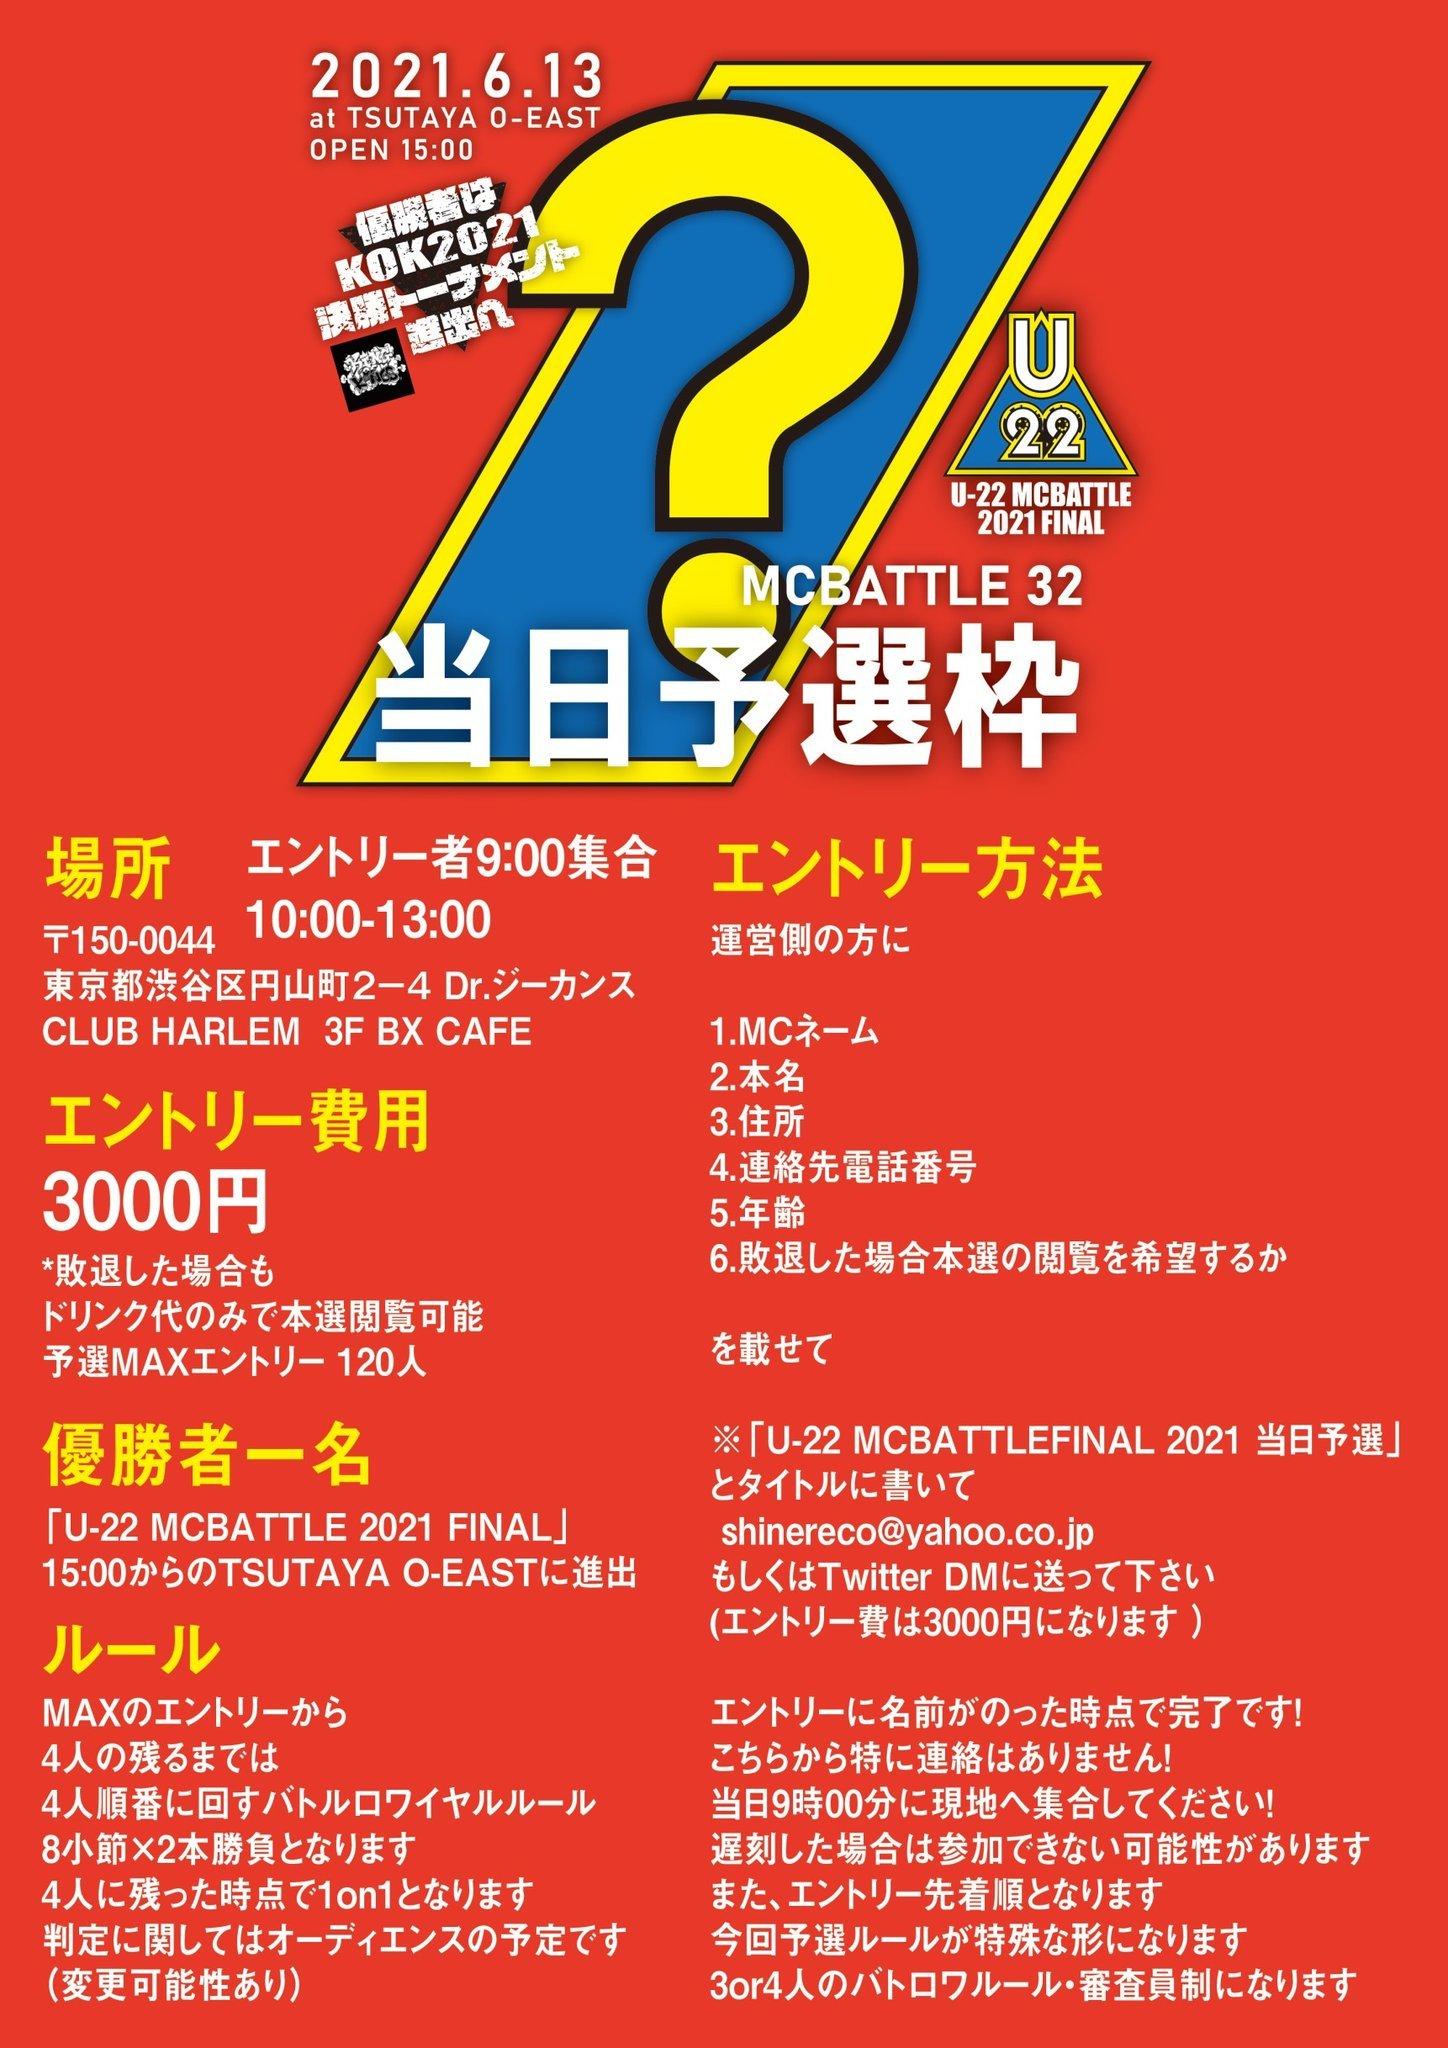 6/13「U-22 MCBATTLE 2021 FINAL当日予選」エントリー66人。朝から9時集合!当日予選枠も募集します_e0246863_22122223.jpg